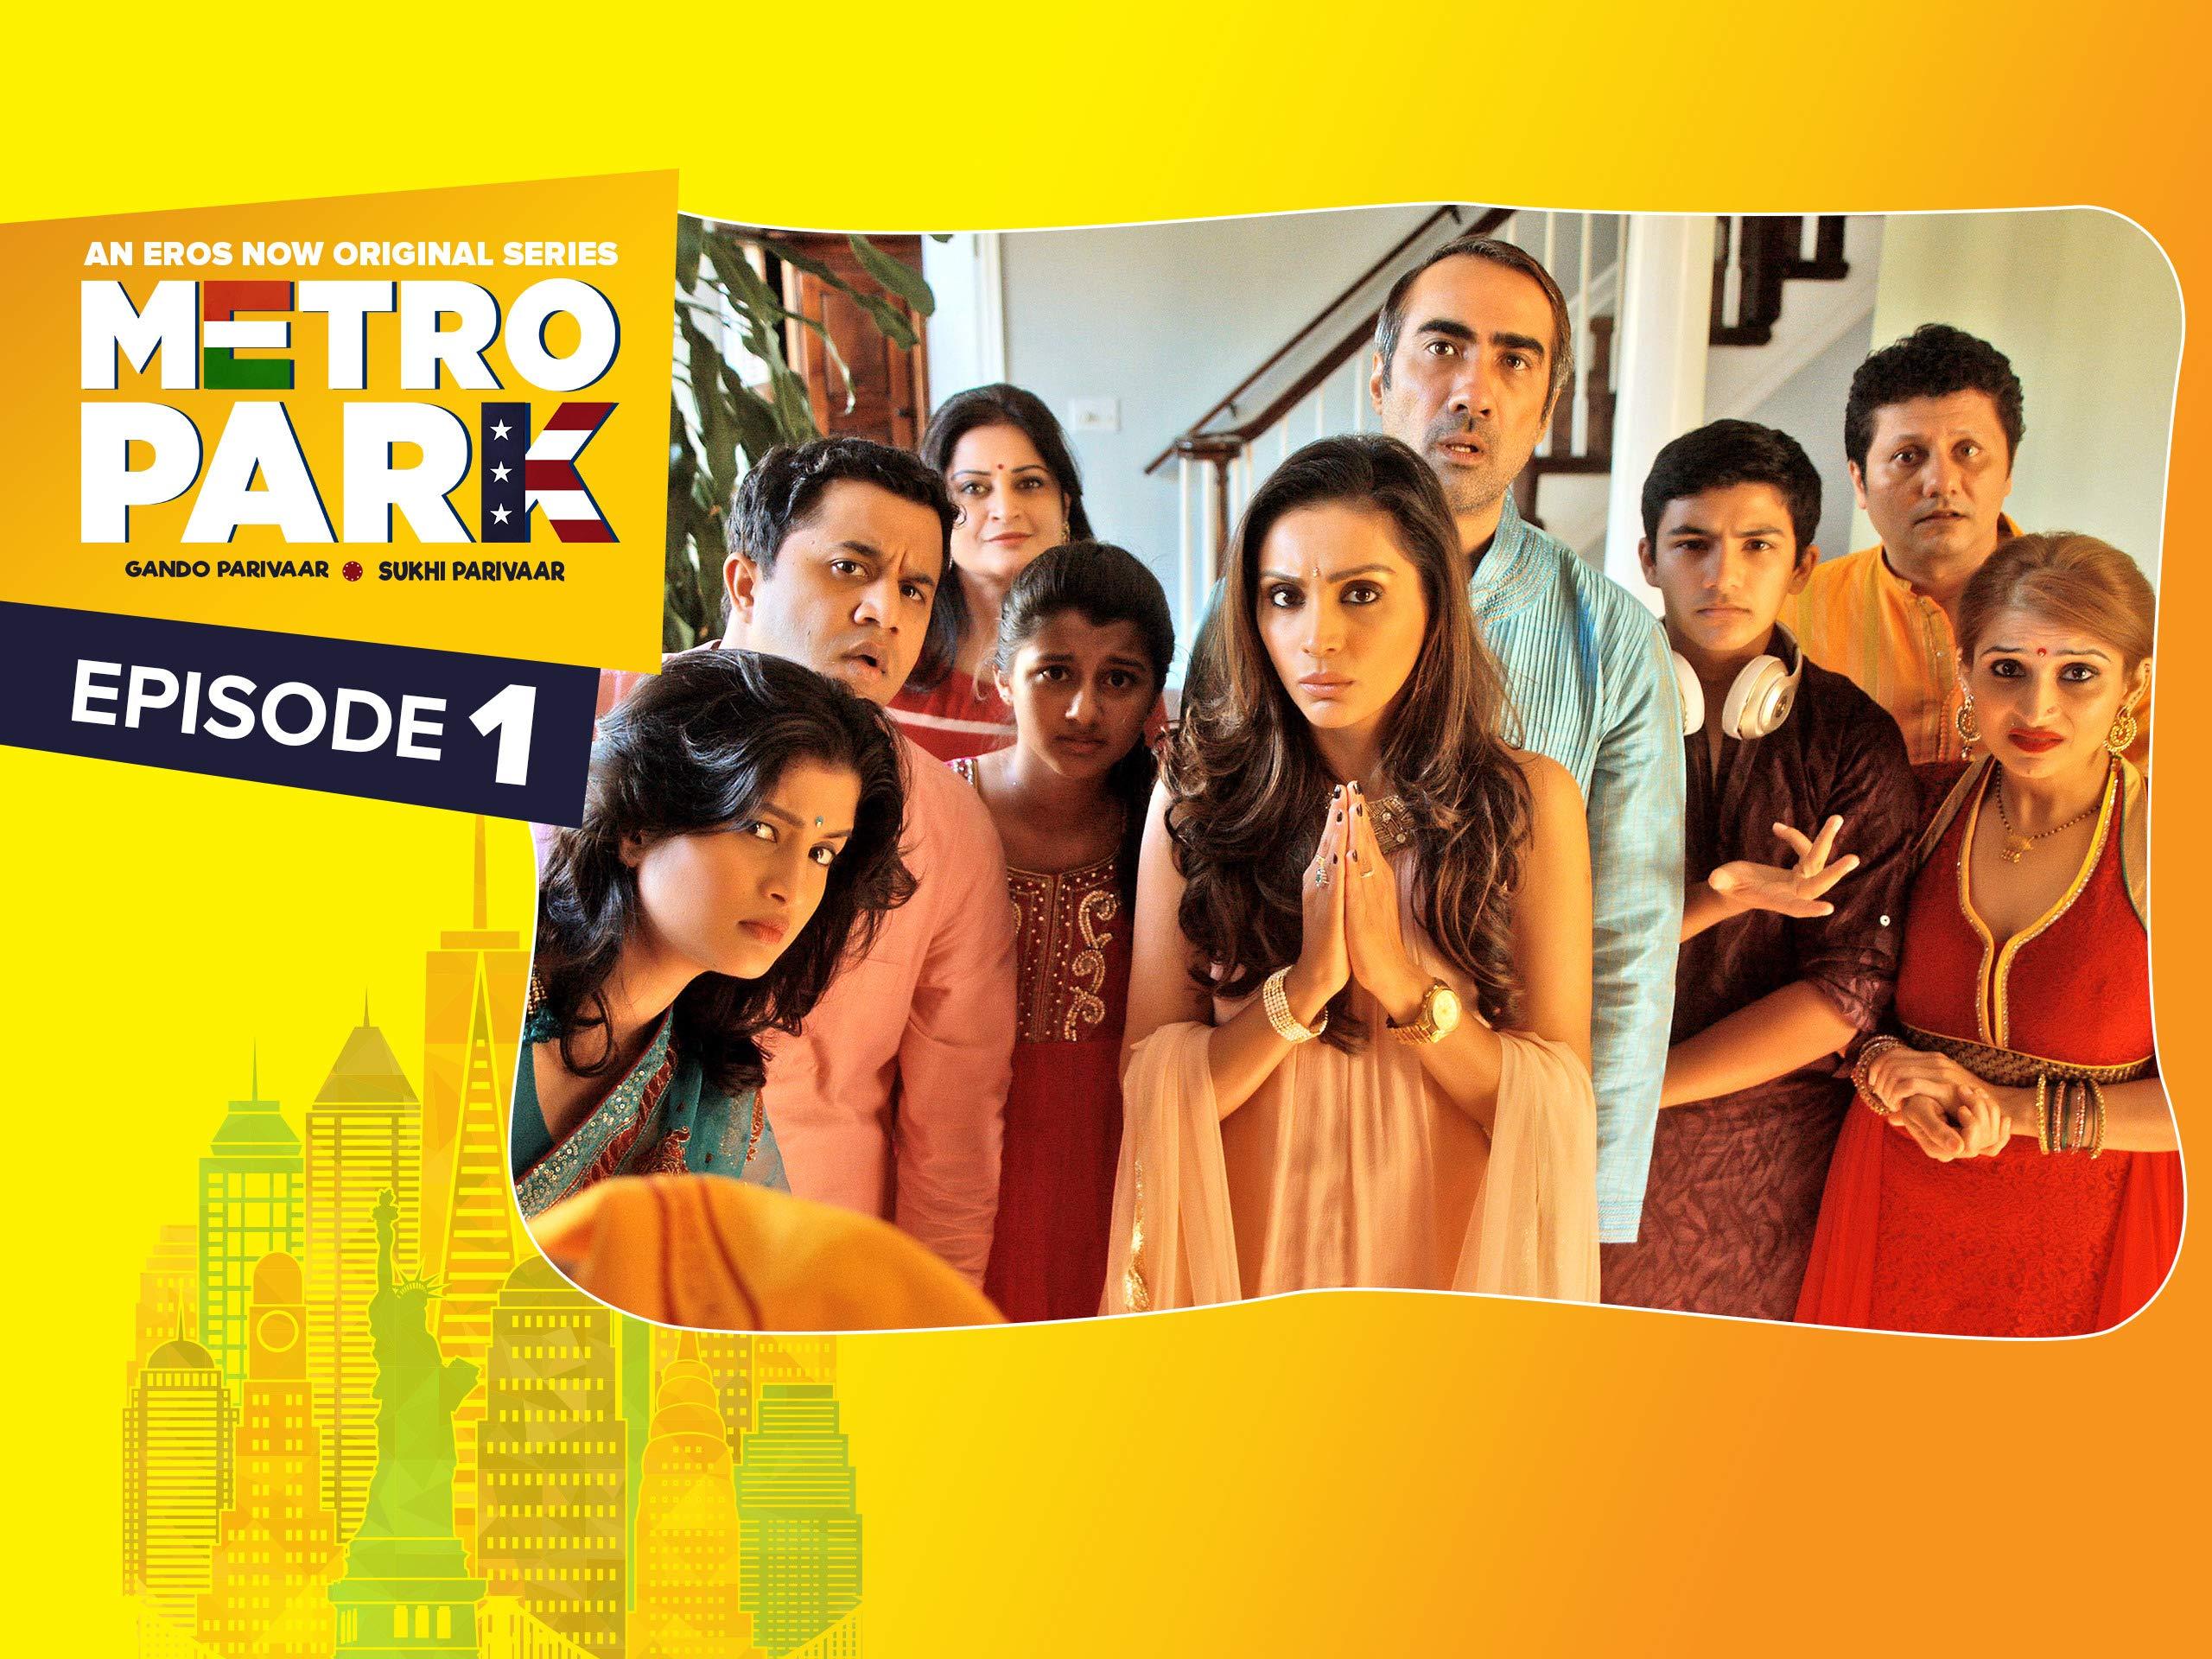 Ranvir Shorey Starrer Metro Park Season 2- Continuation of the NRI Family Story